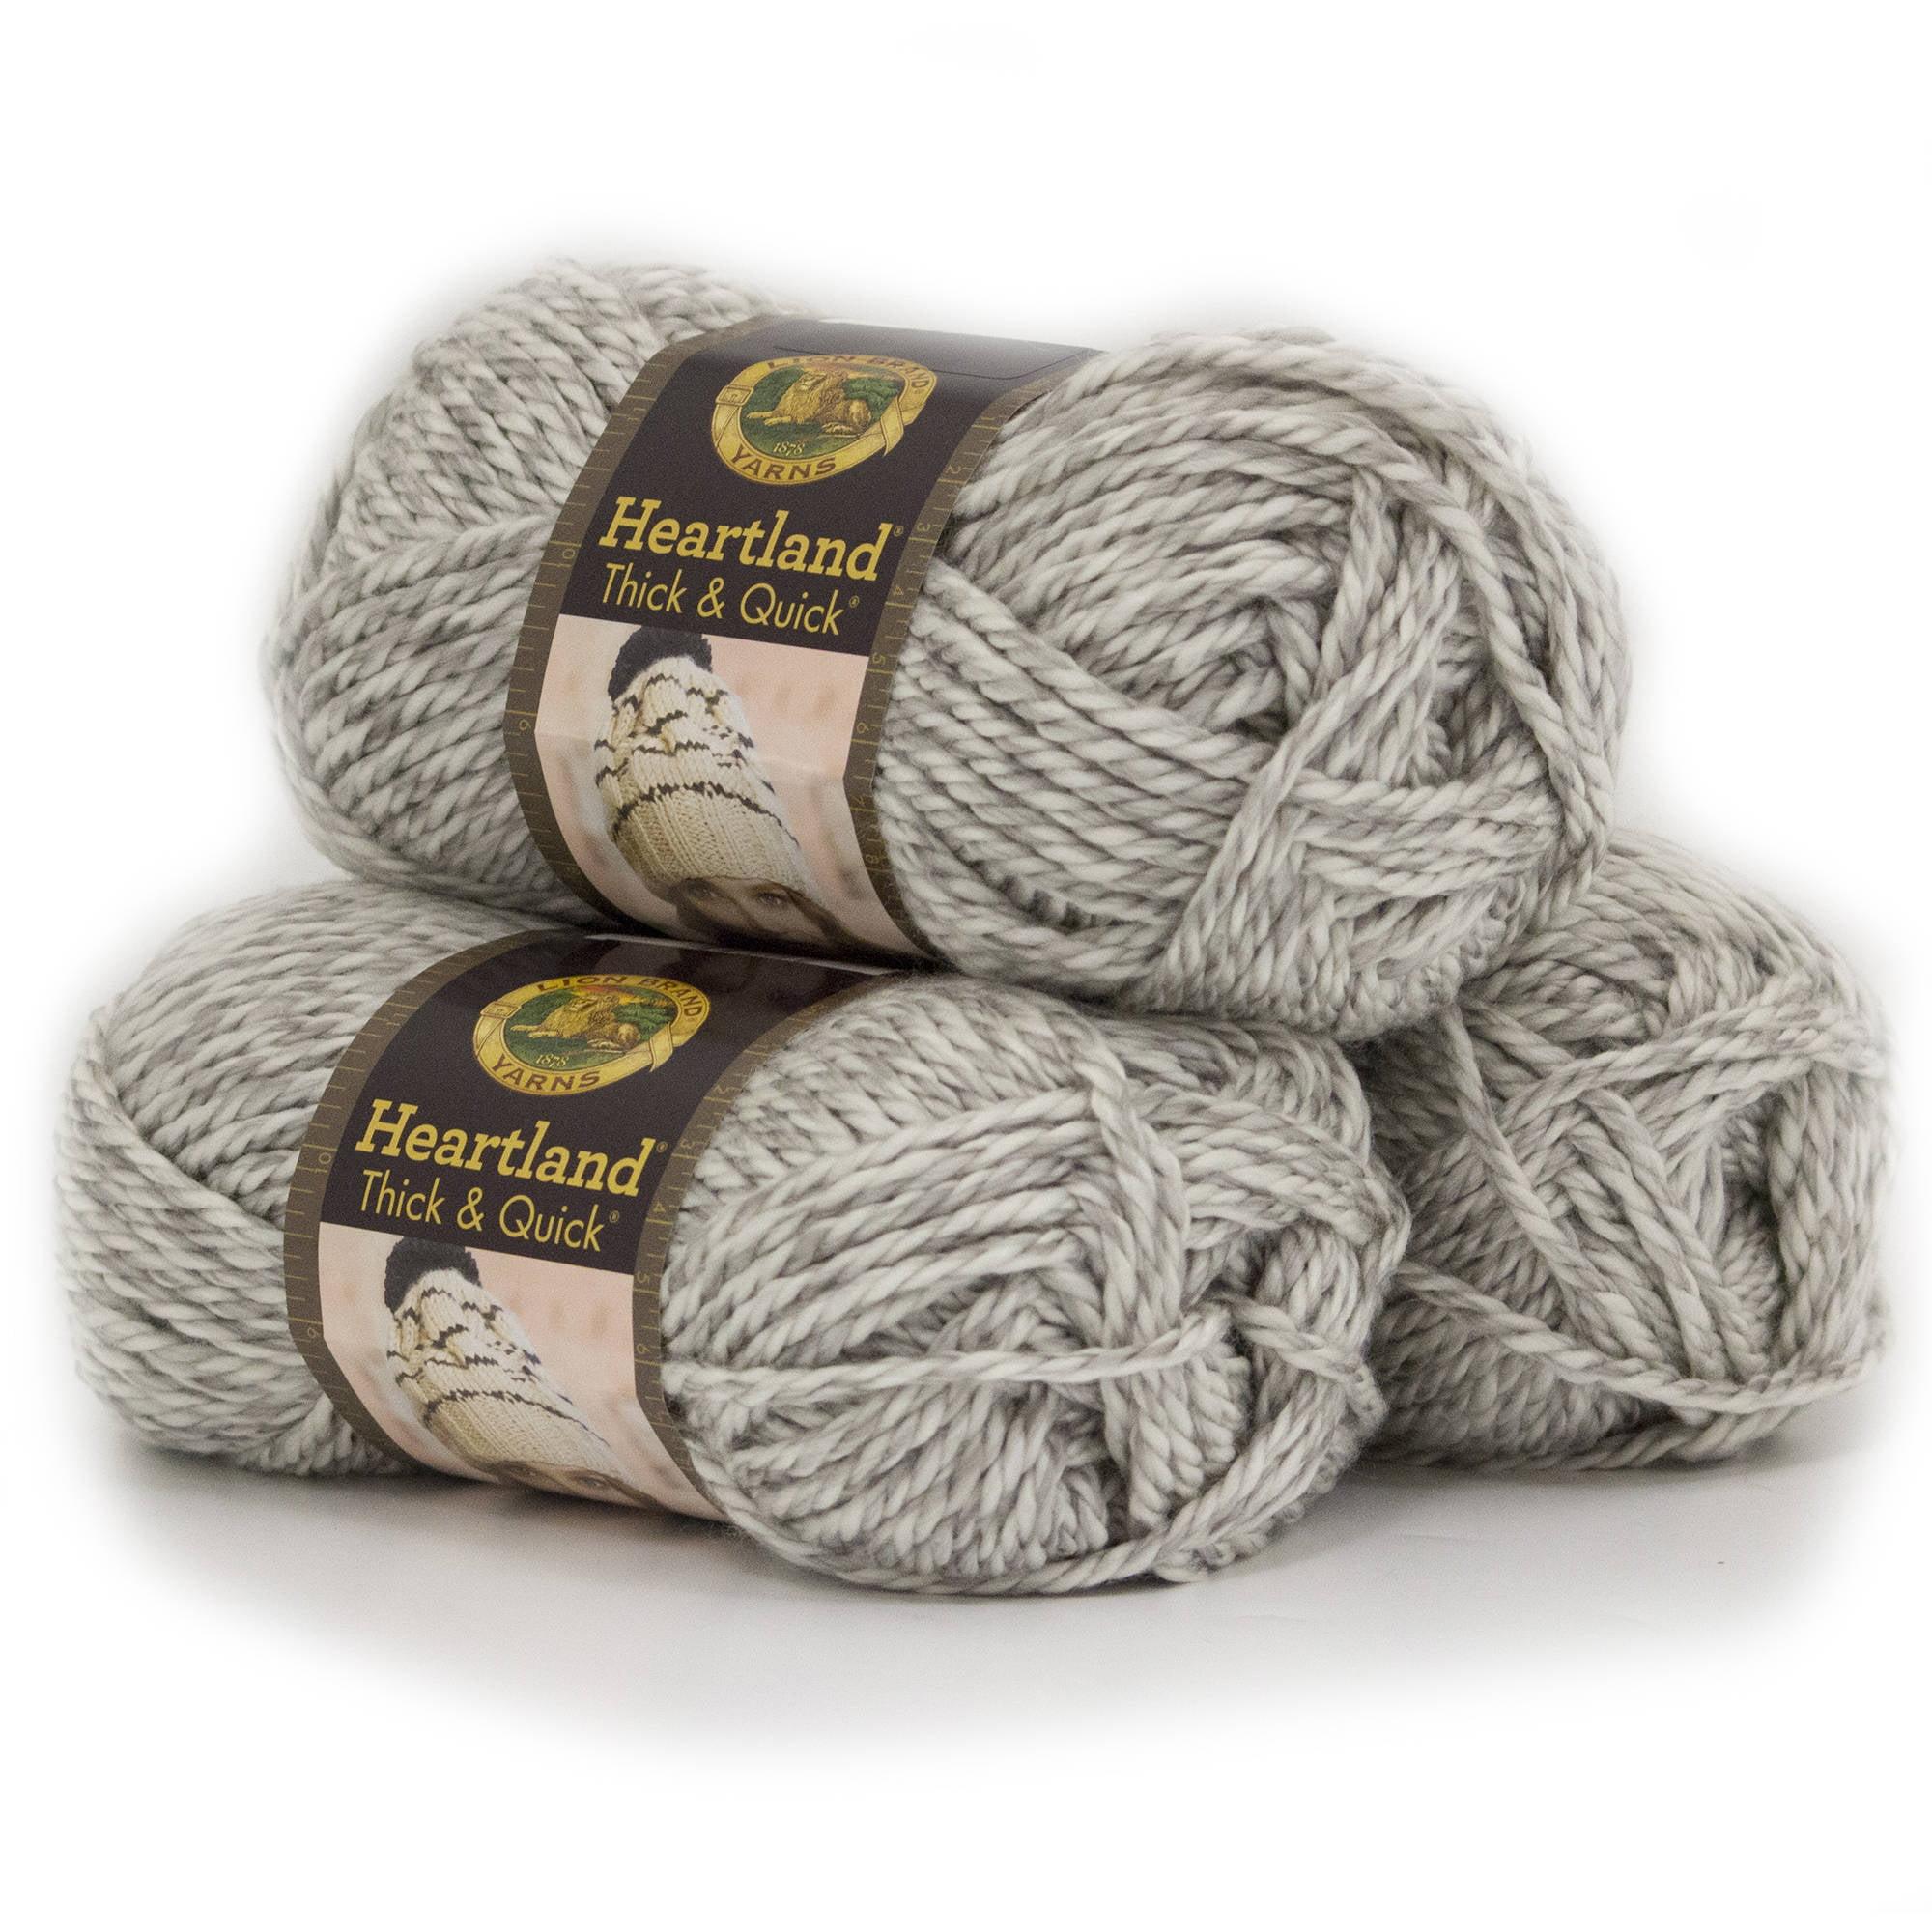 Lion Brand Yarn Heartland Thick and Quick Classic Yarn, 3pk